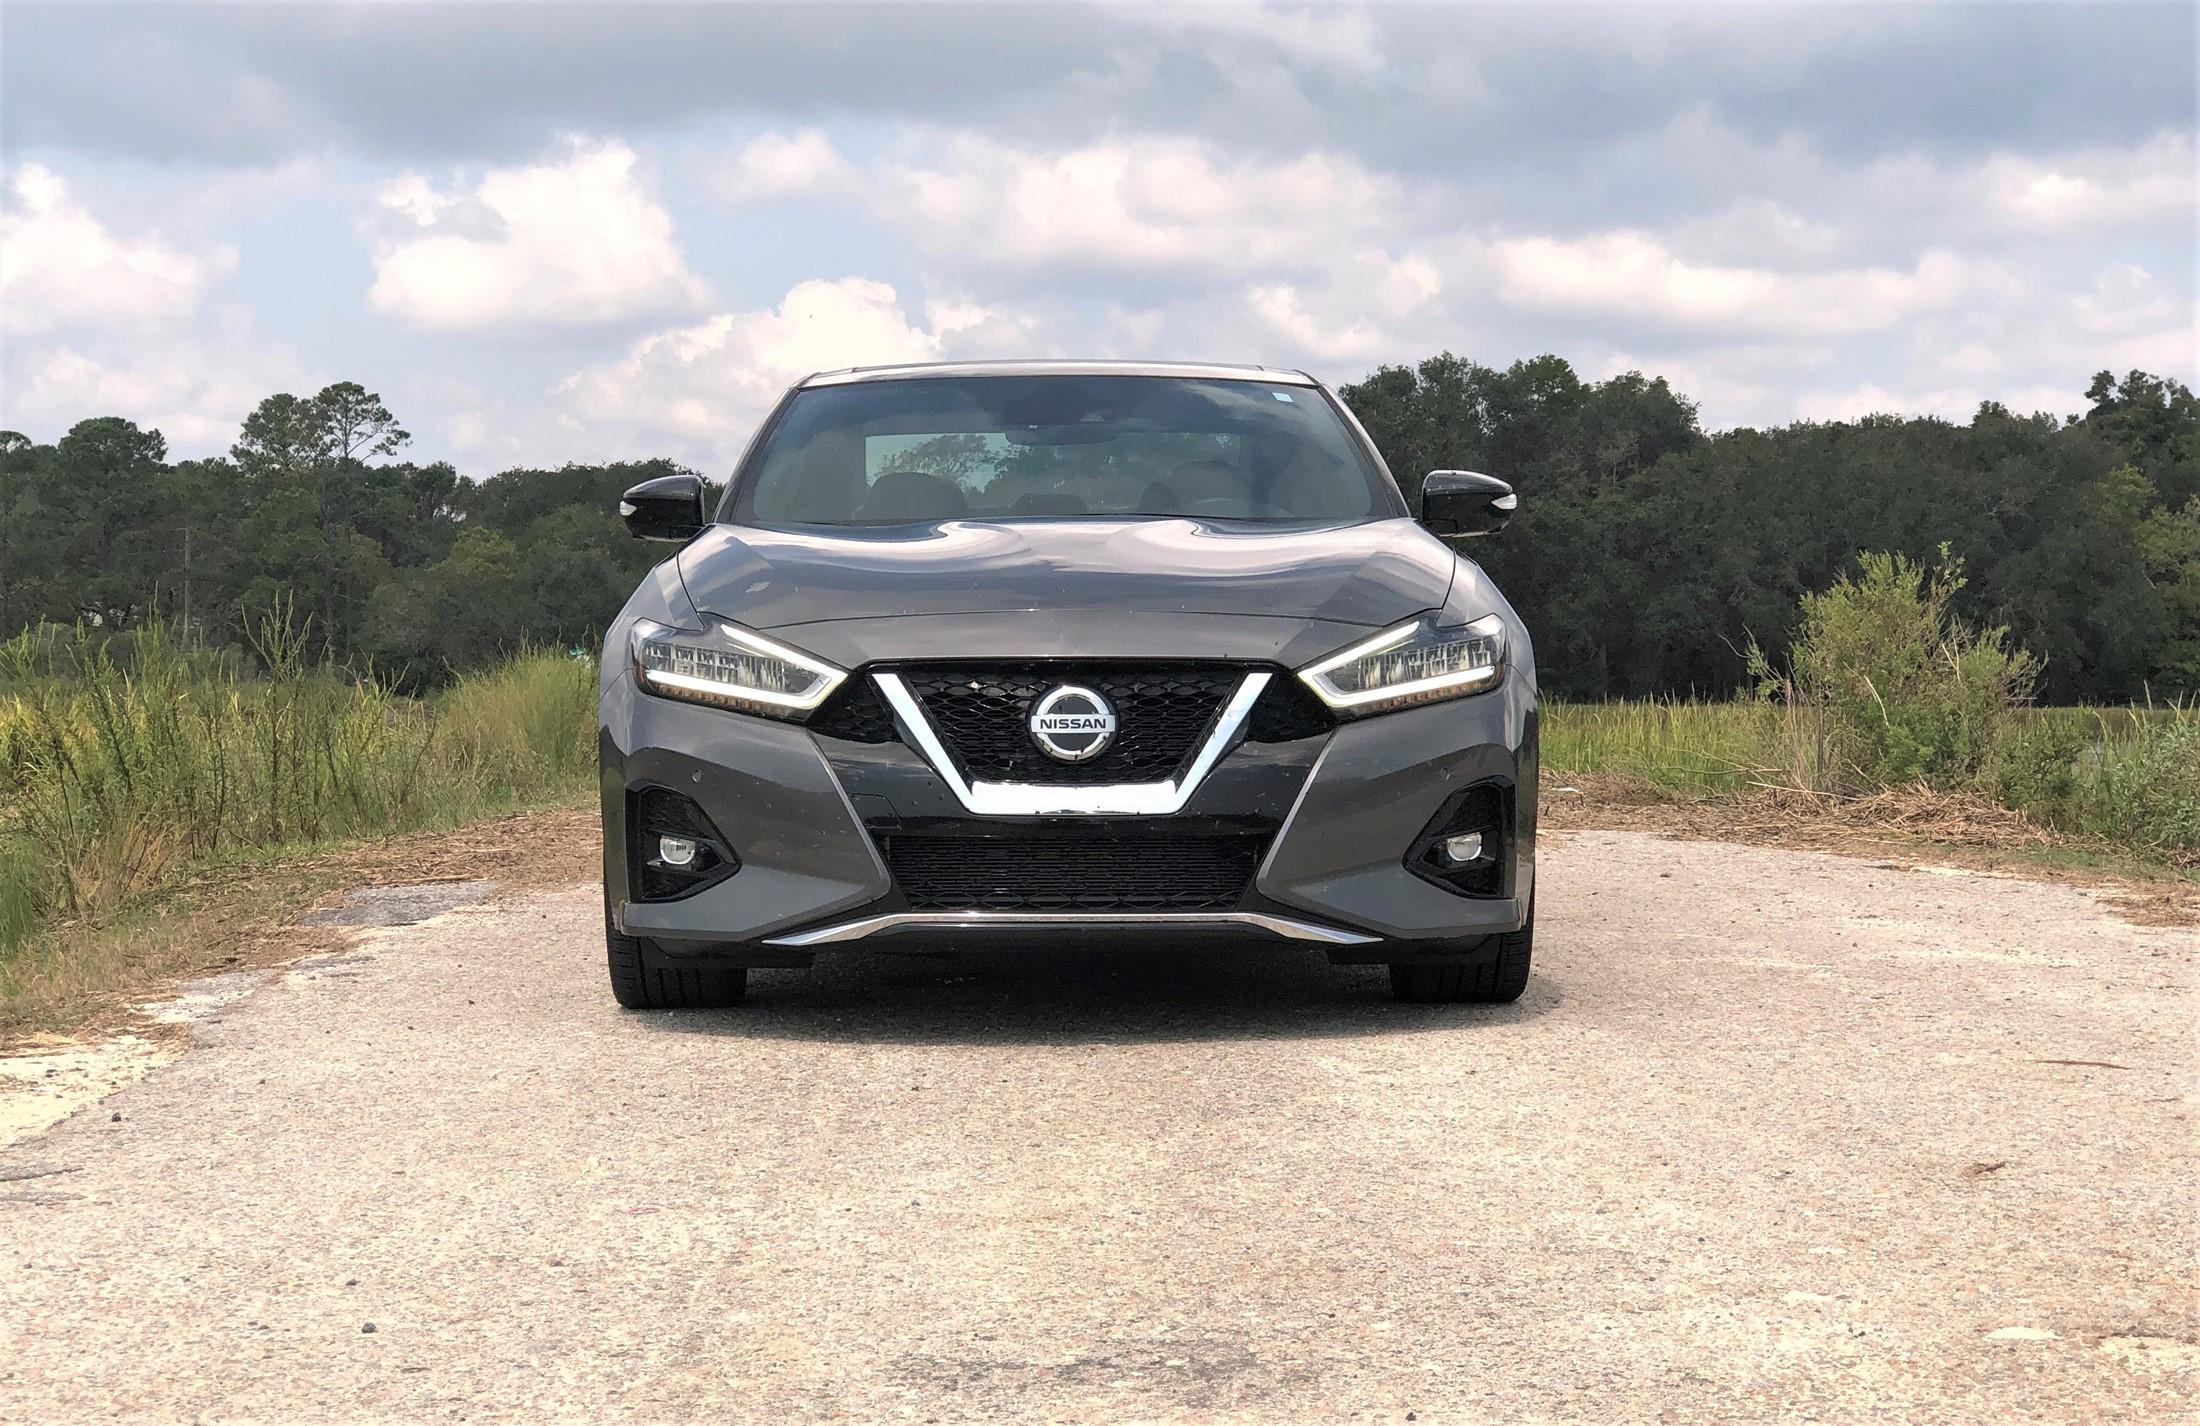 2019 Nissan Maxima Sr Road Test Review Drive Video Car Shopping Car Revs Daily Com